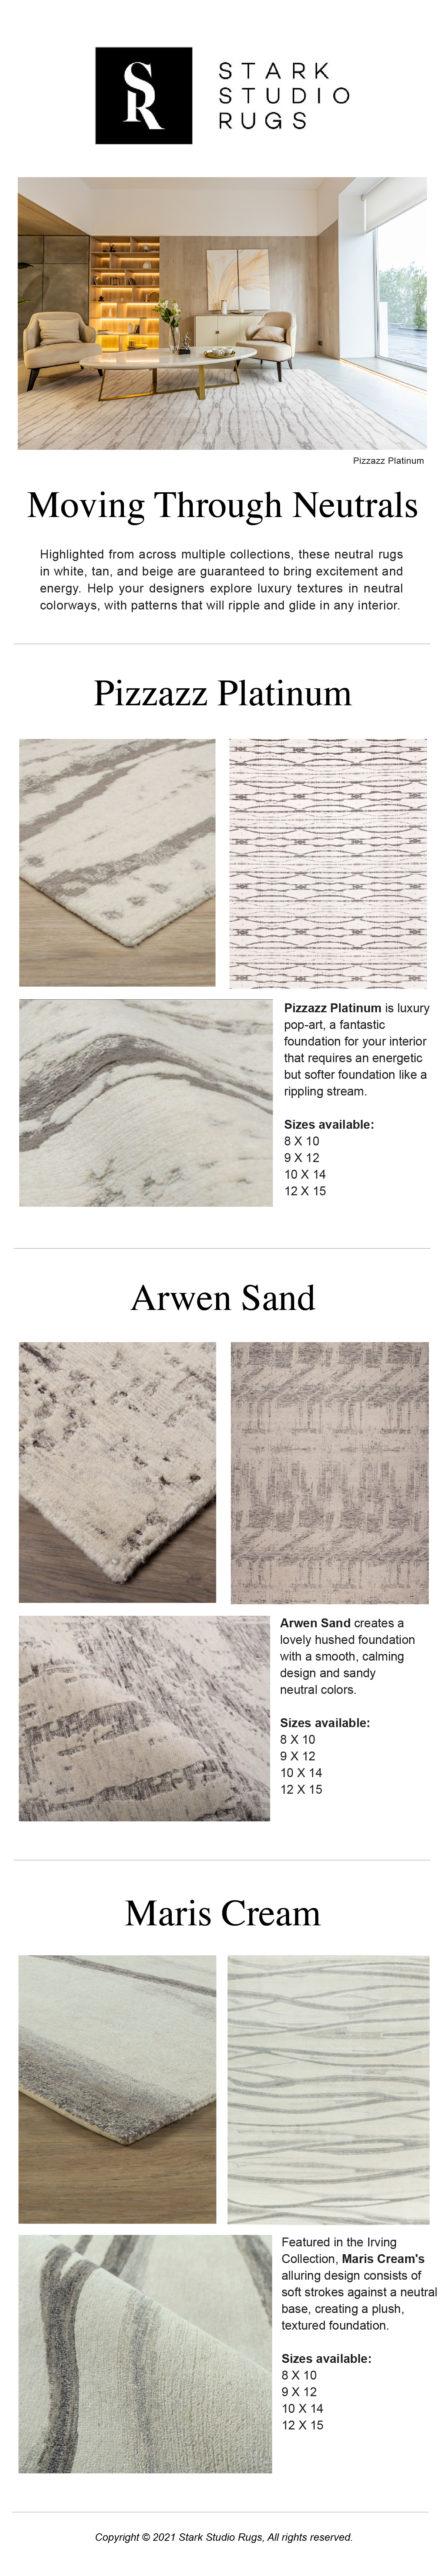 Movement through Neutrals: Flowing Patterns from Stark Studio Rugs